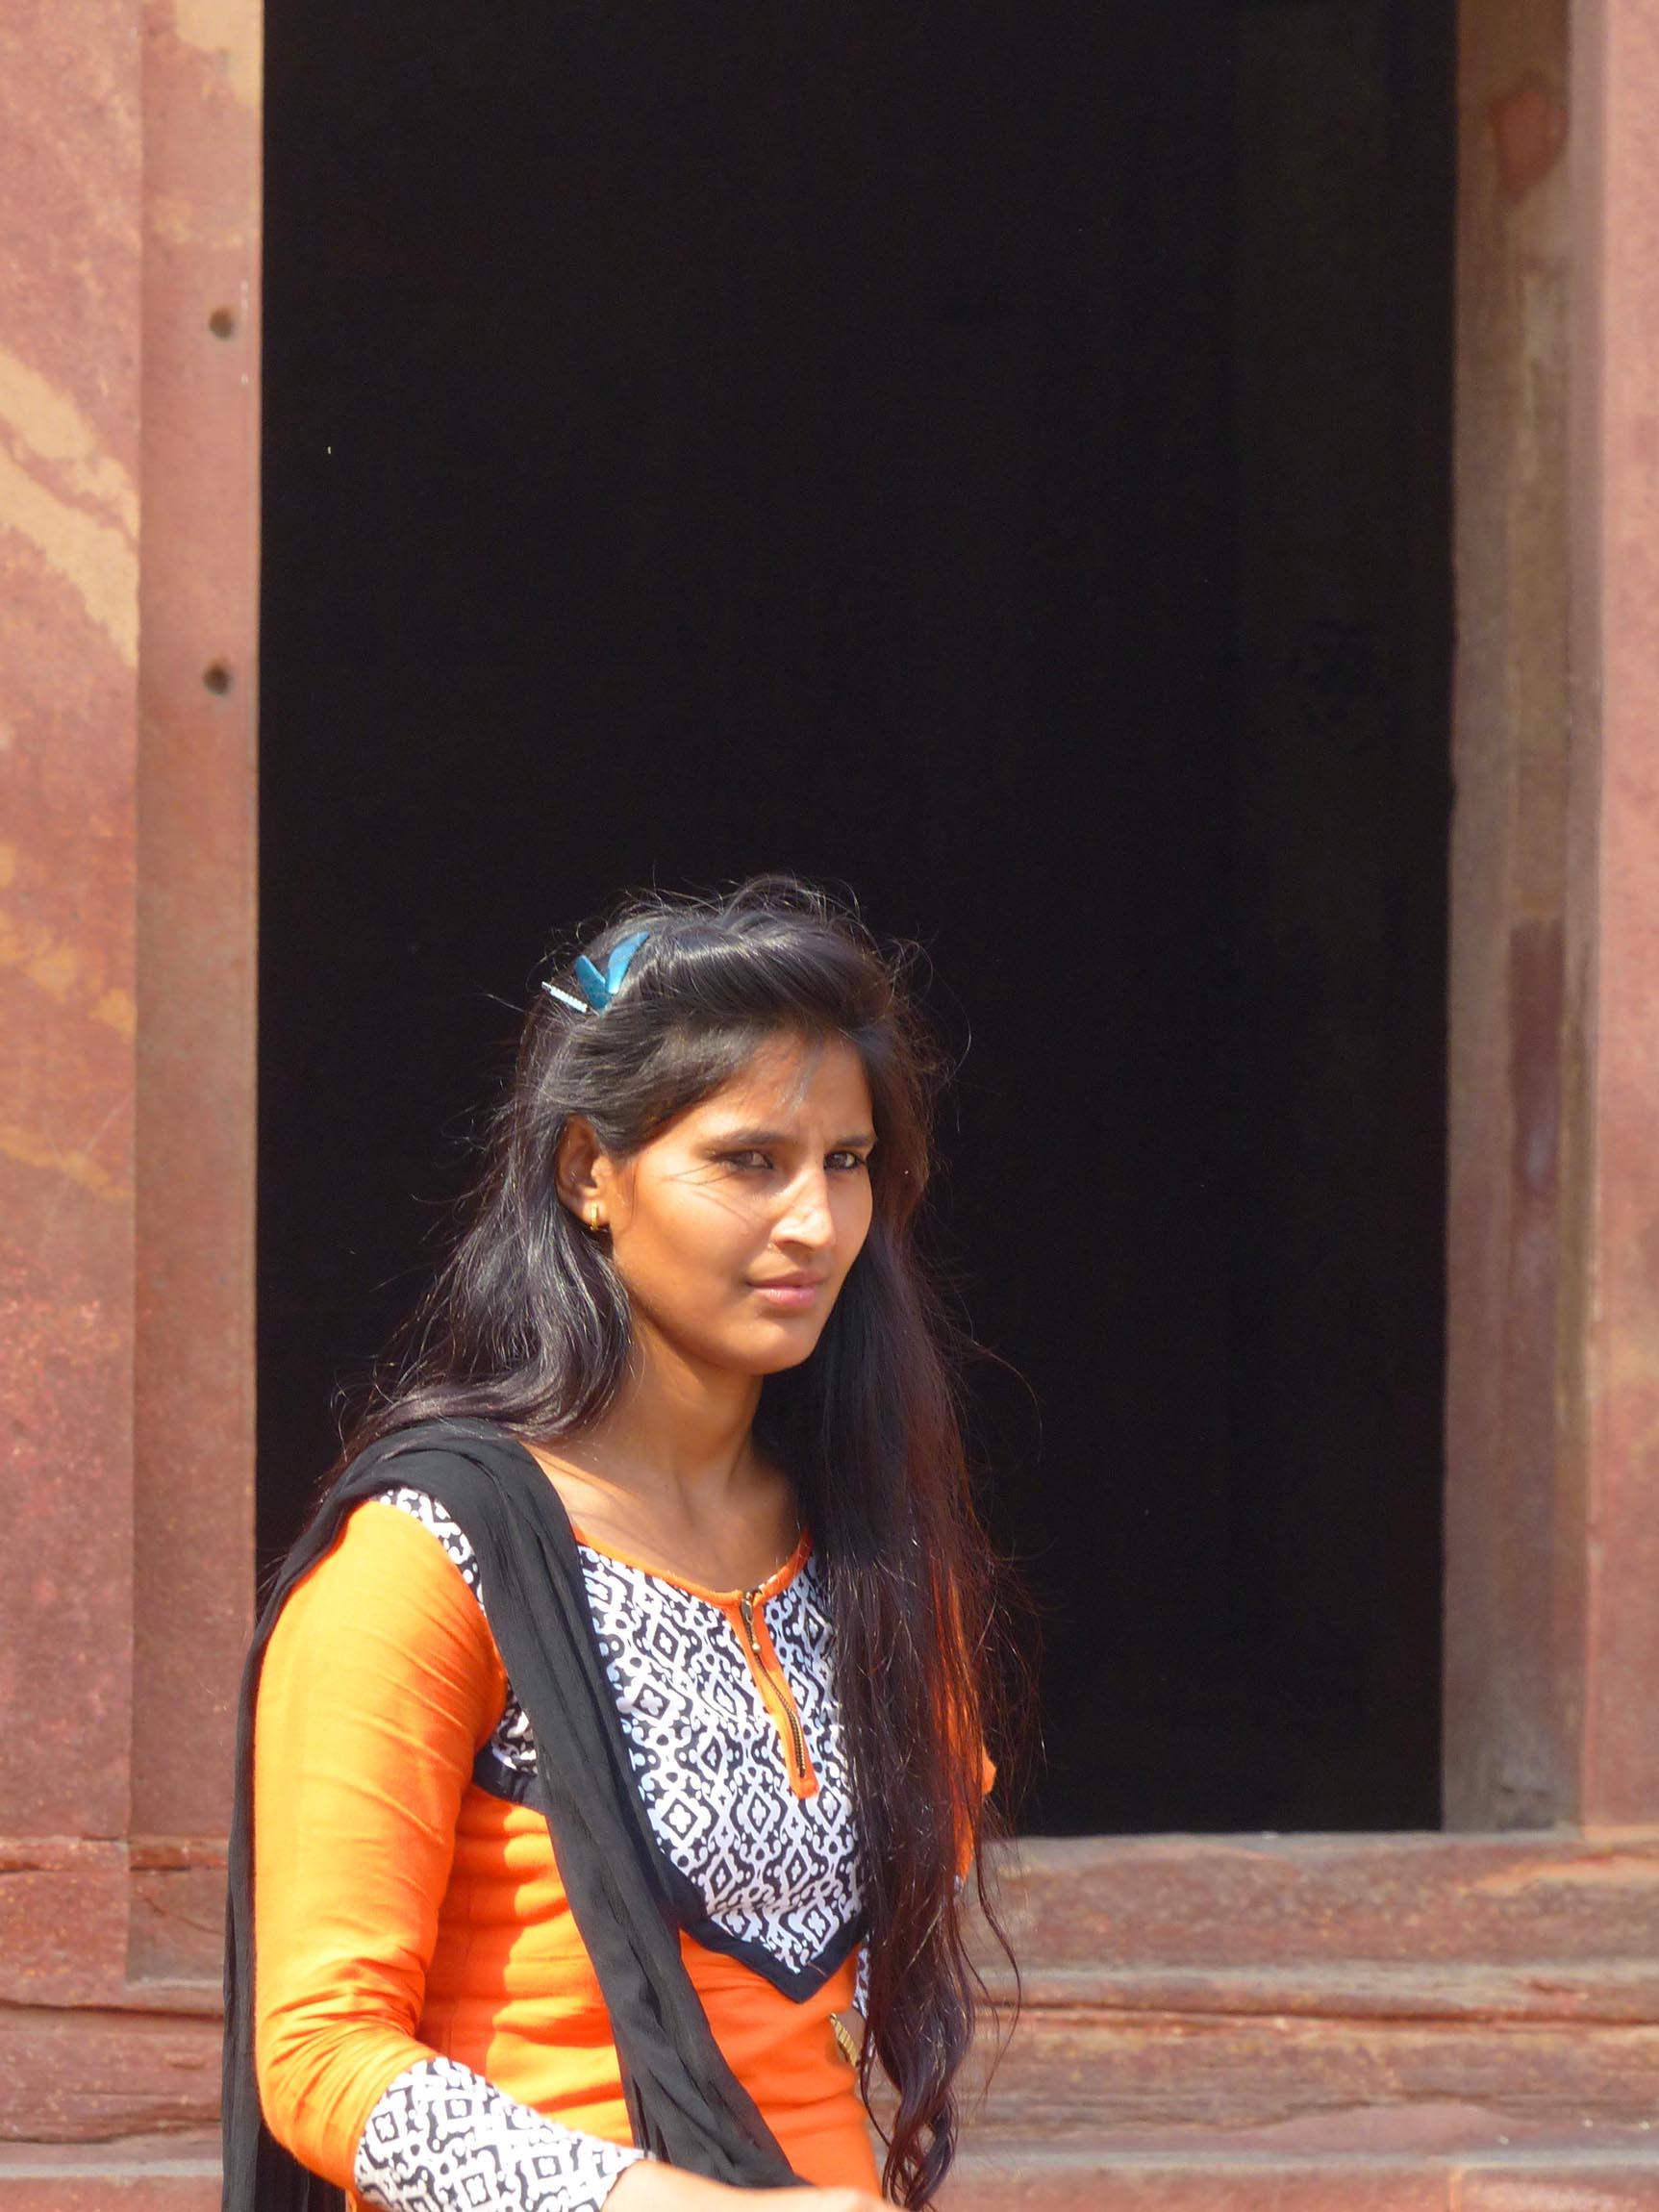 Lady in orange sari by red sandstone building